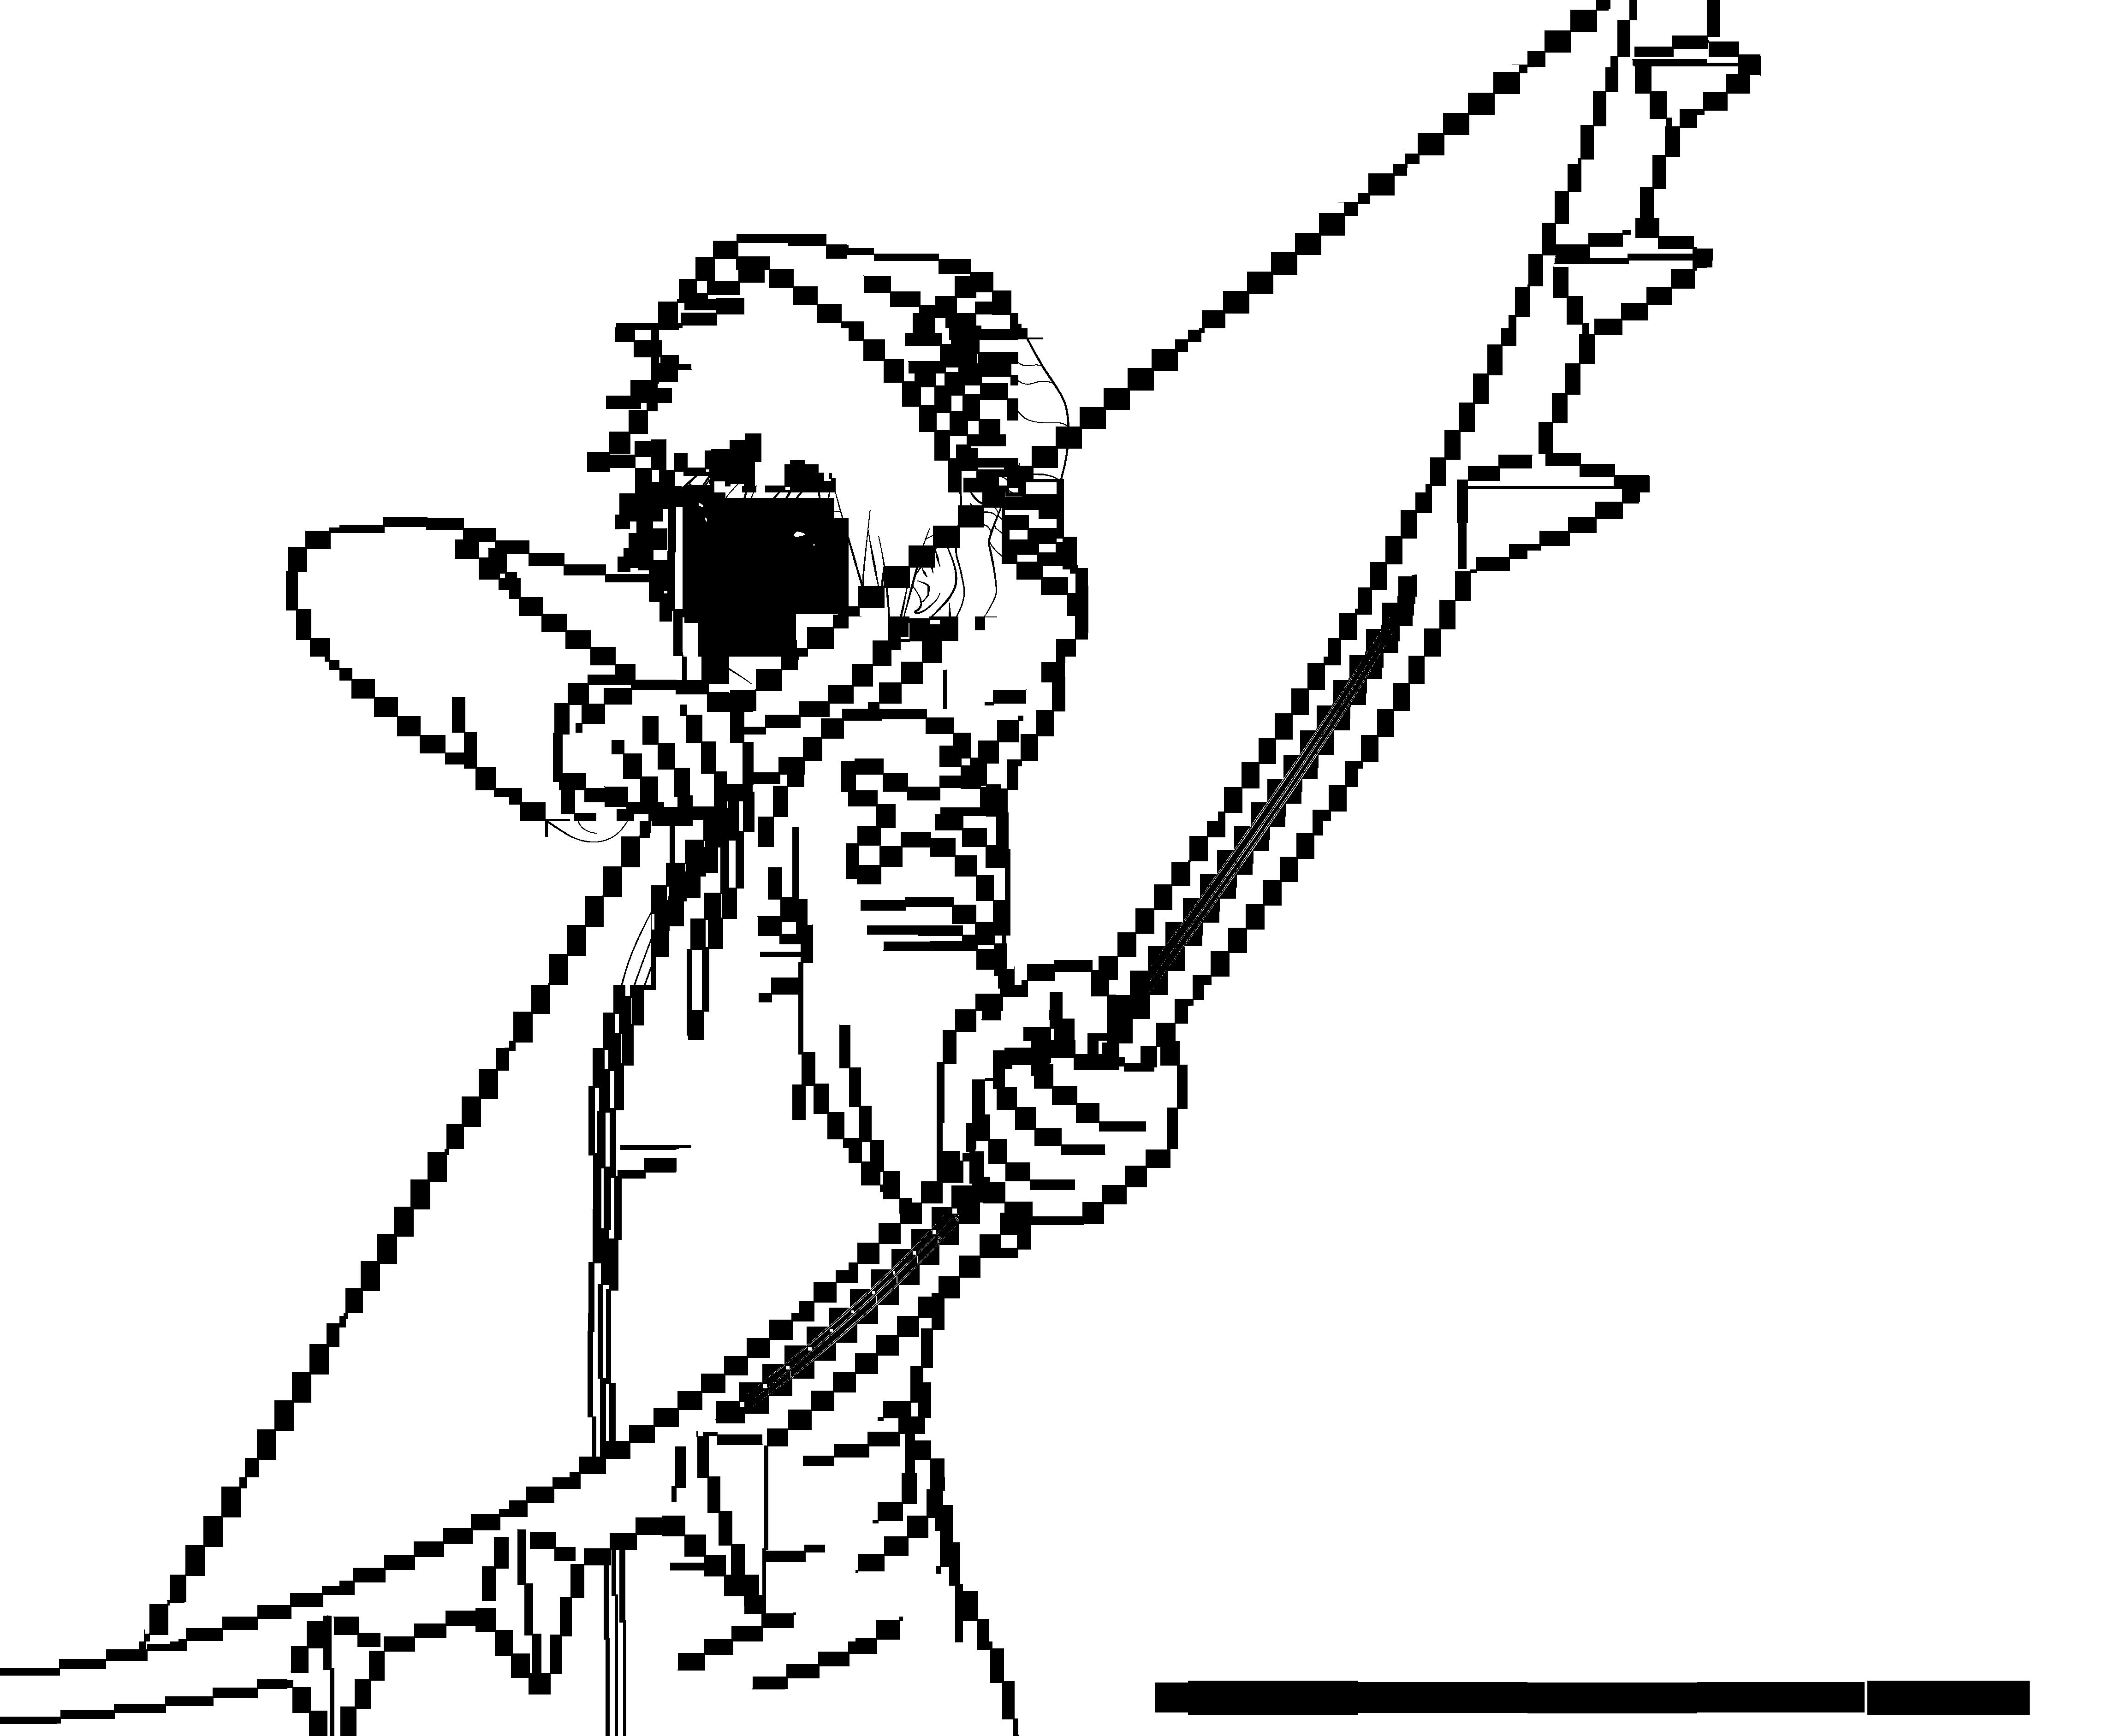 Ichigo FanArt (Lineart). by llSwaggerll